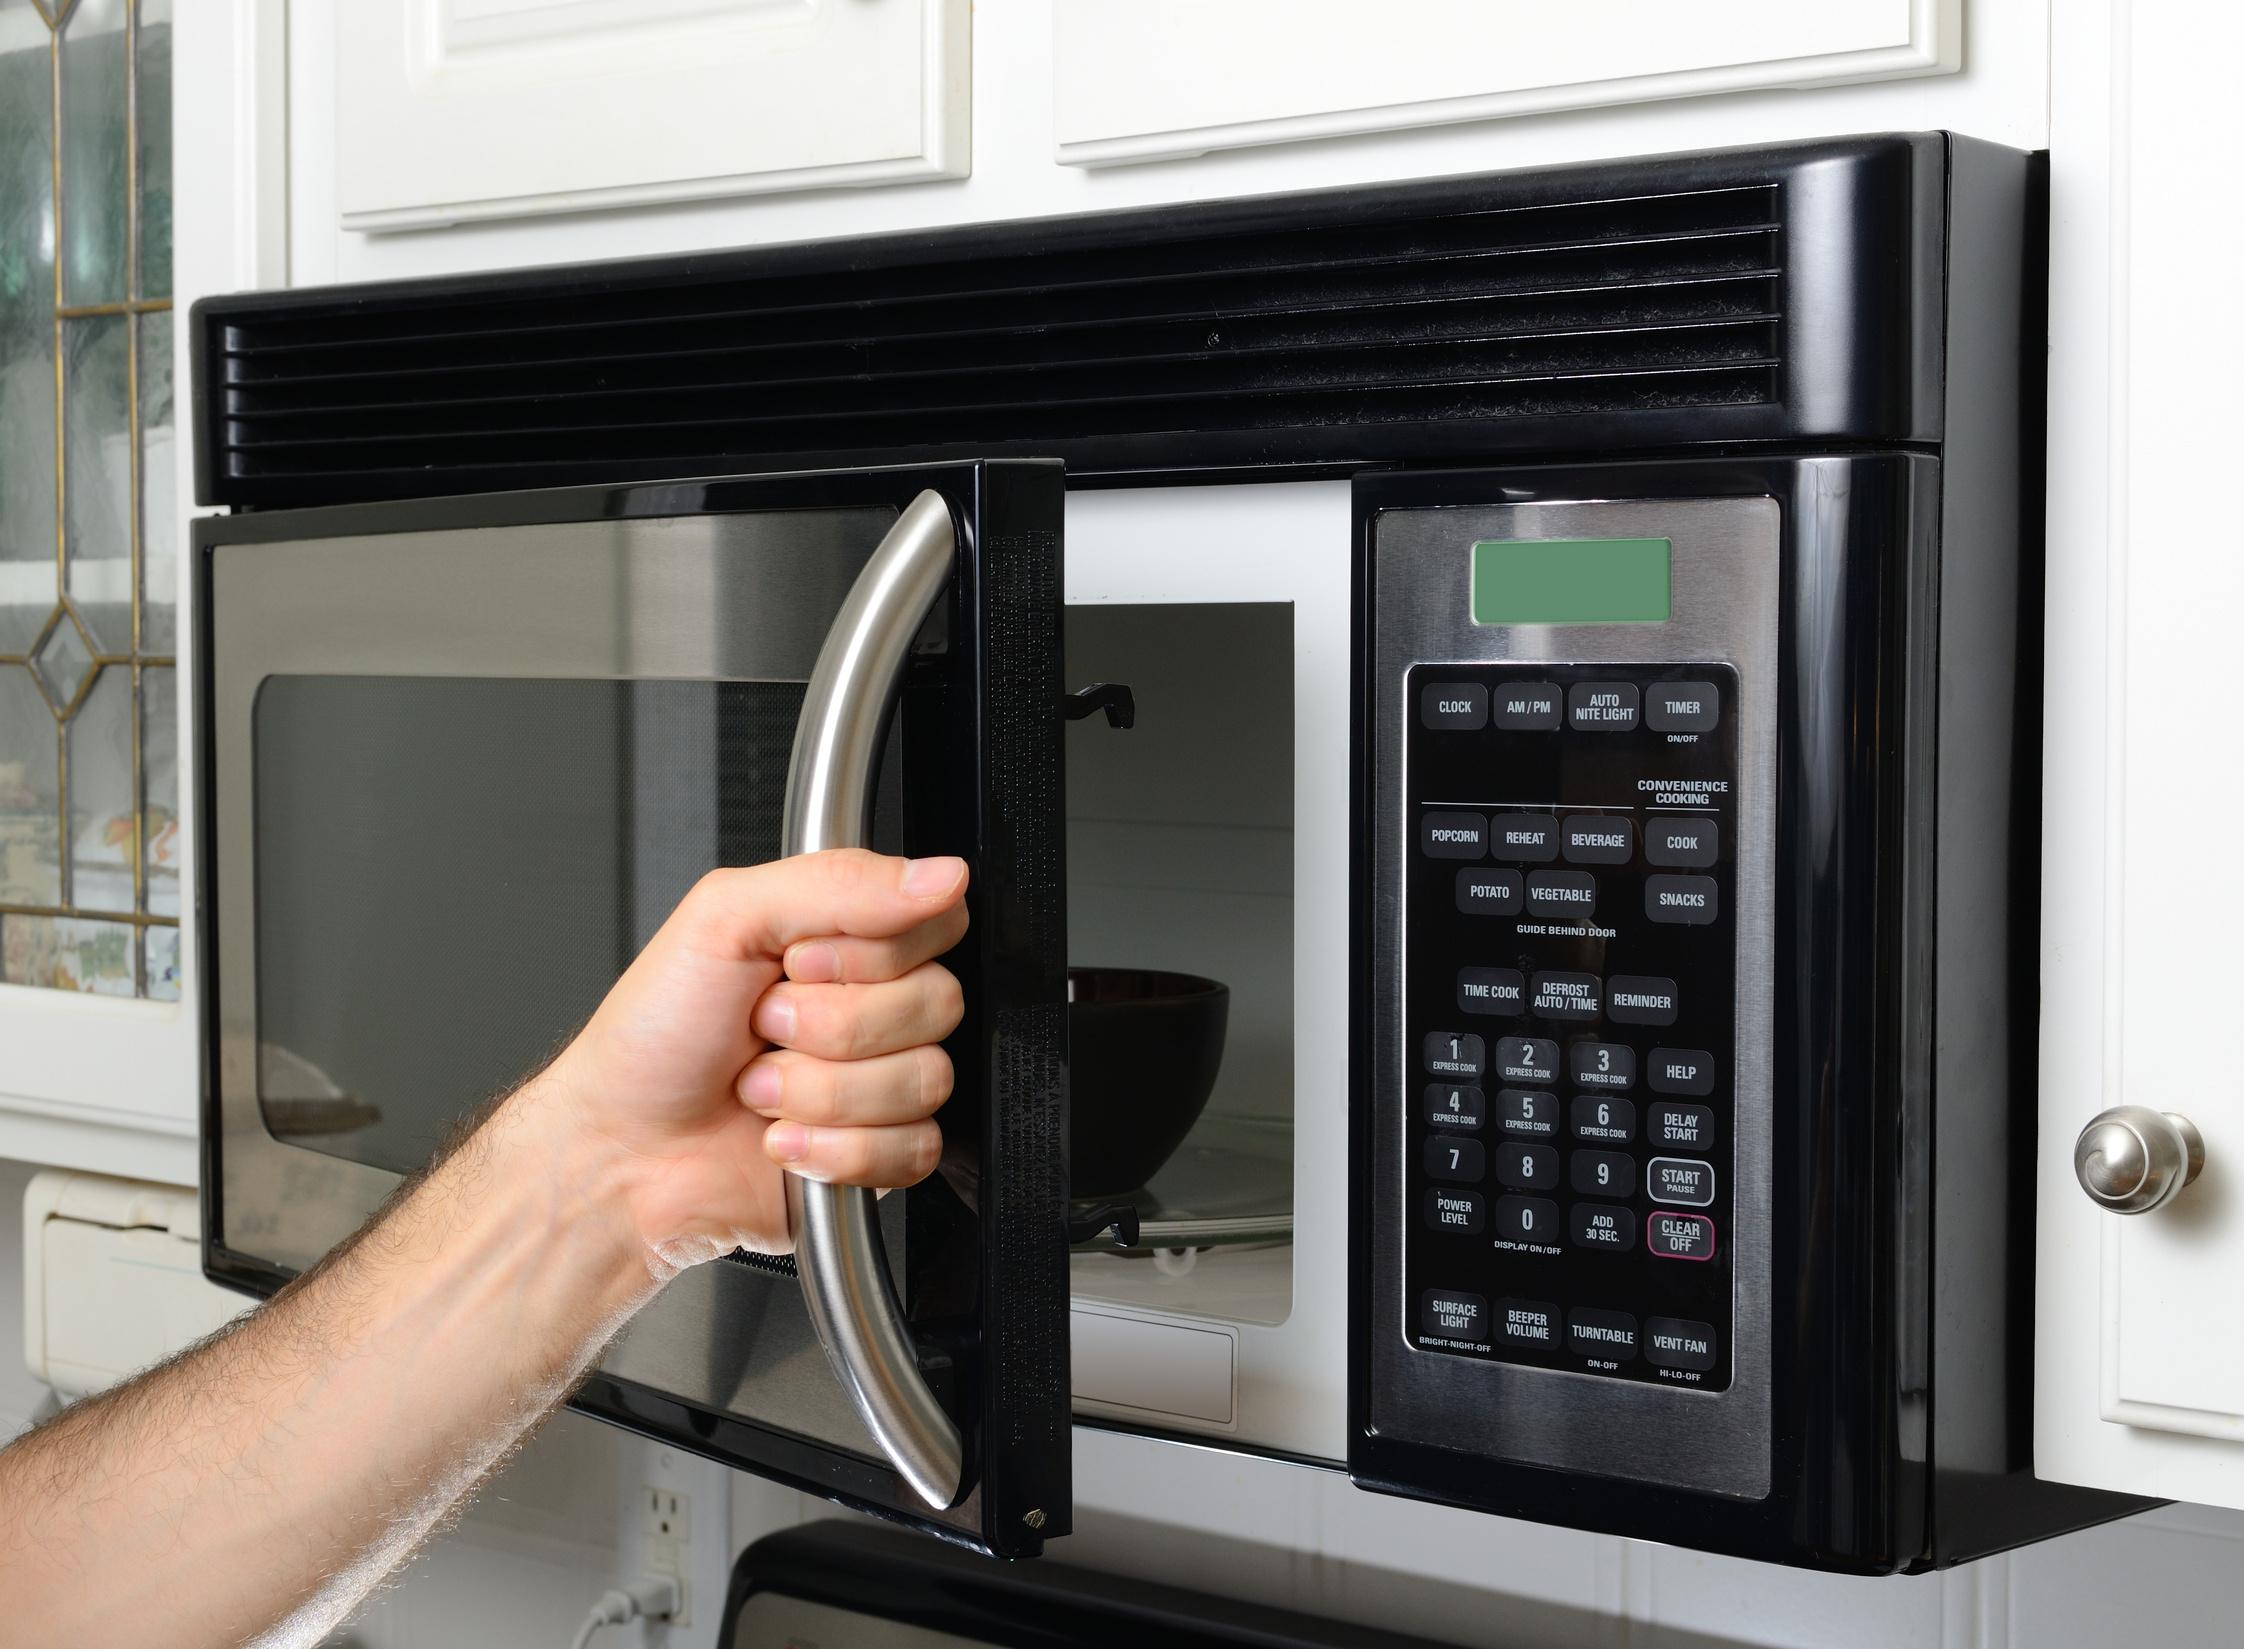 opeing a microwave door